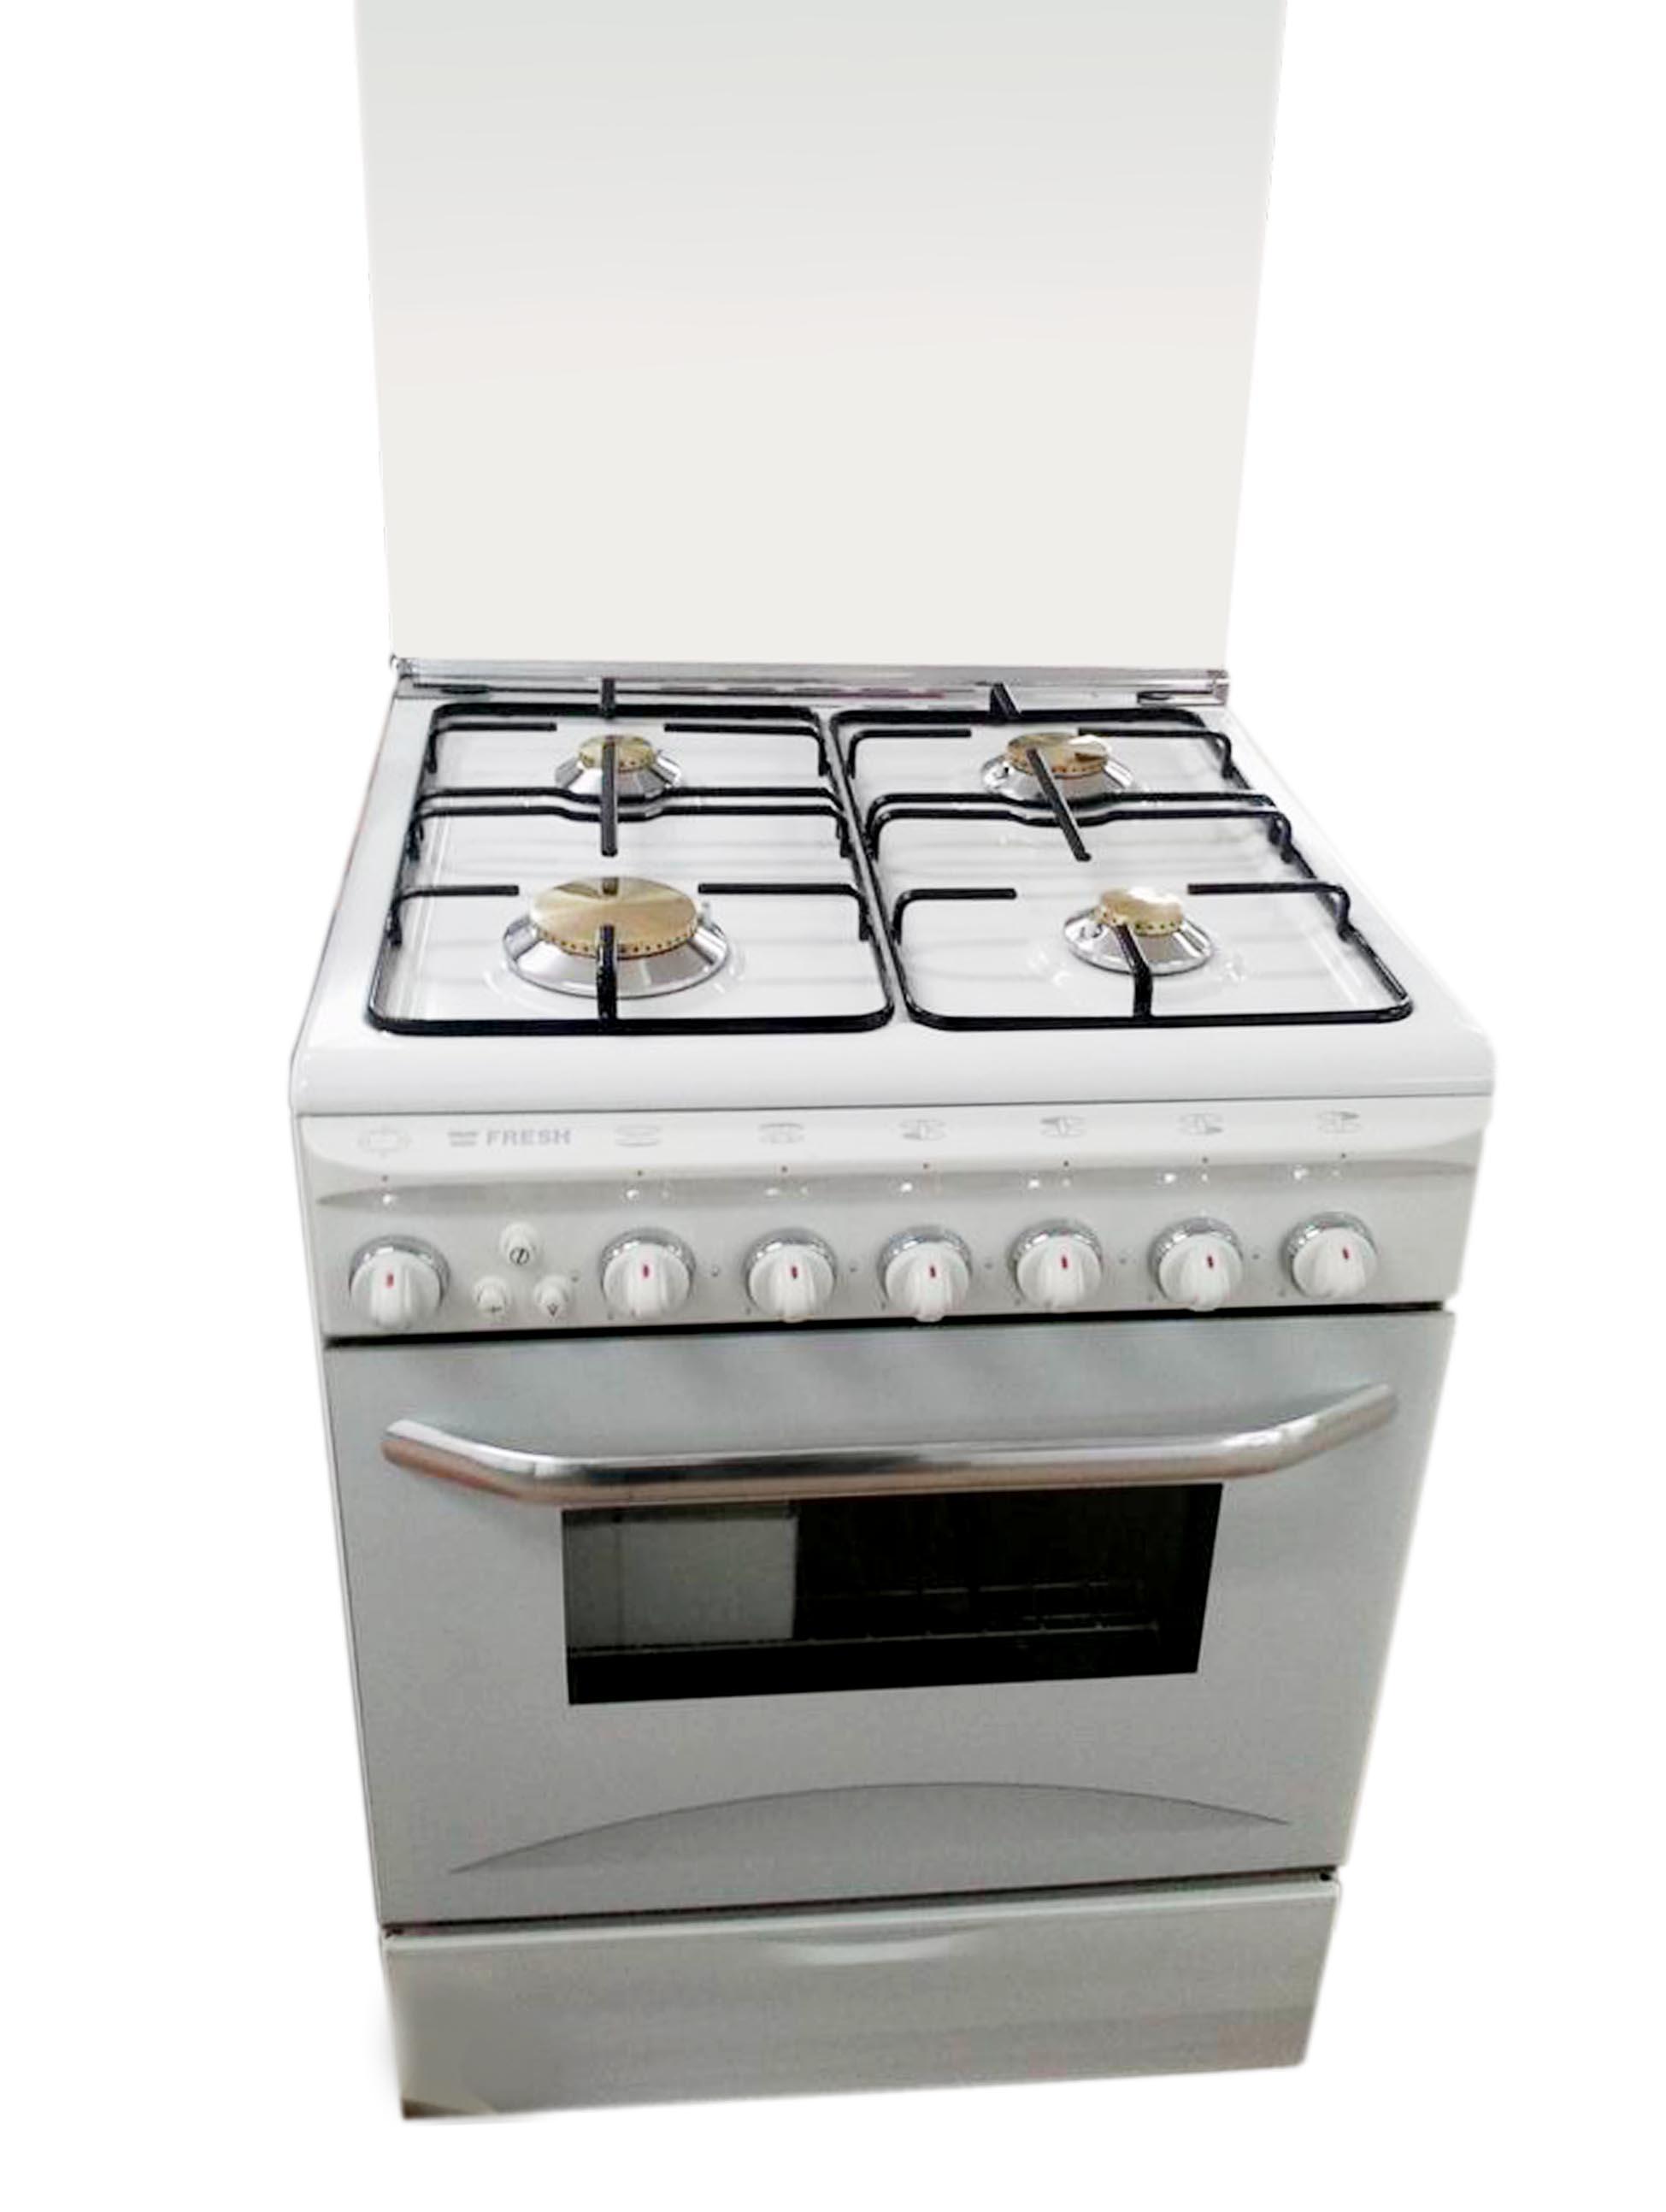 Плита газовая Fresh Italiano 60х60 белая (подсветка, розжиг, гриль)